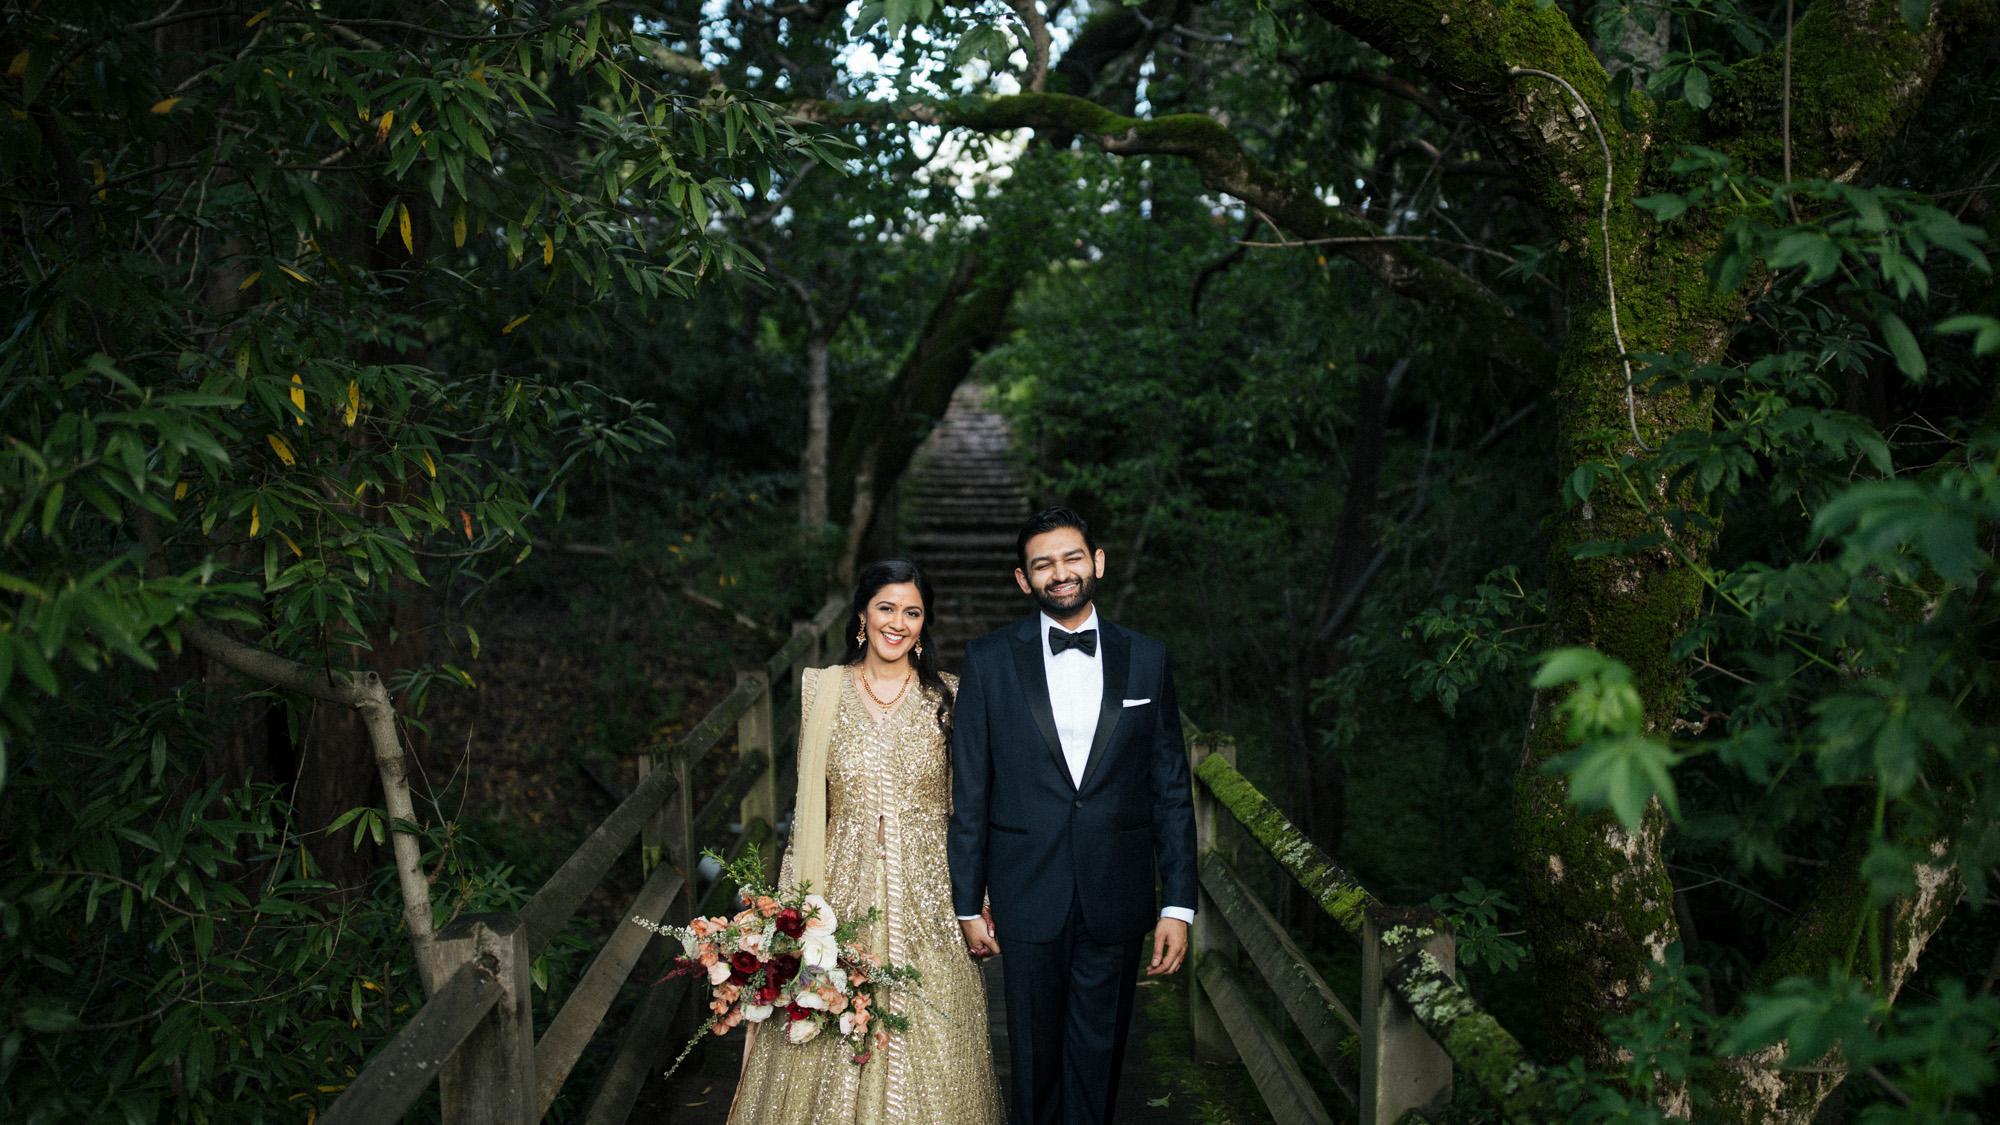 anu_maneesh_alec_vanderboom_Indian_wedding_photography-0140.jpg